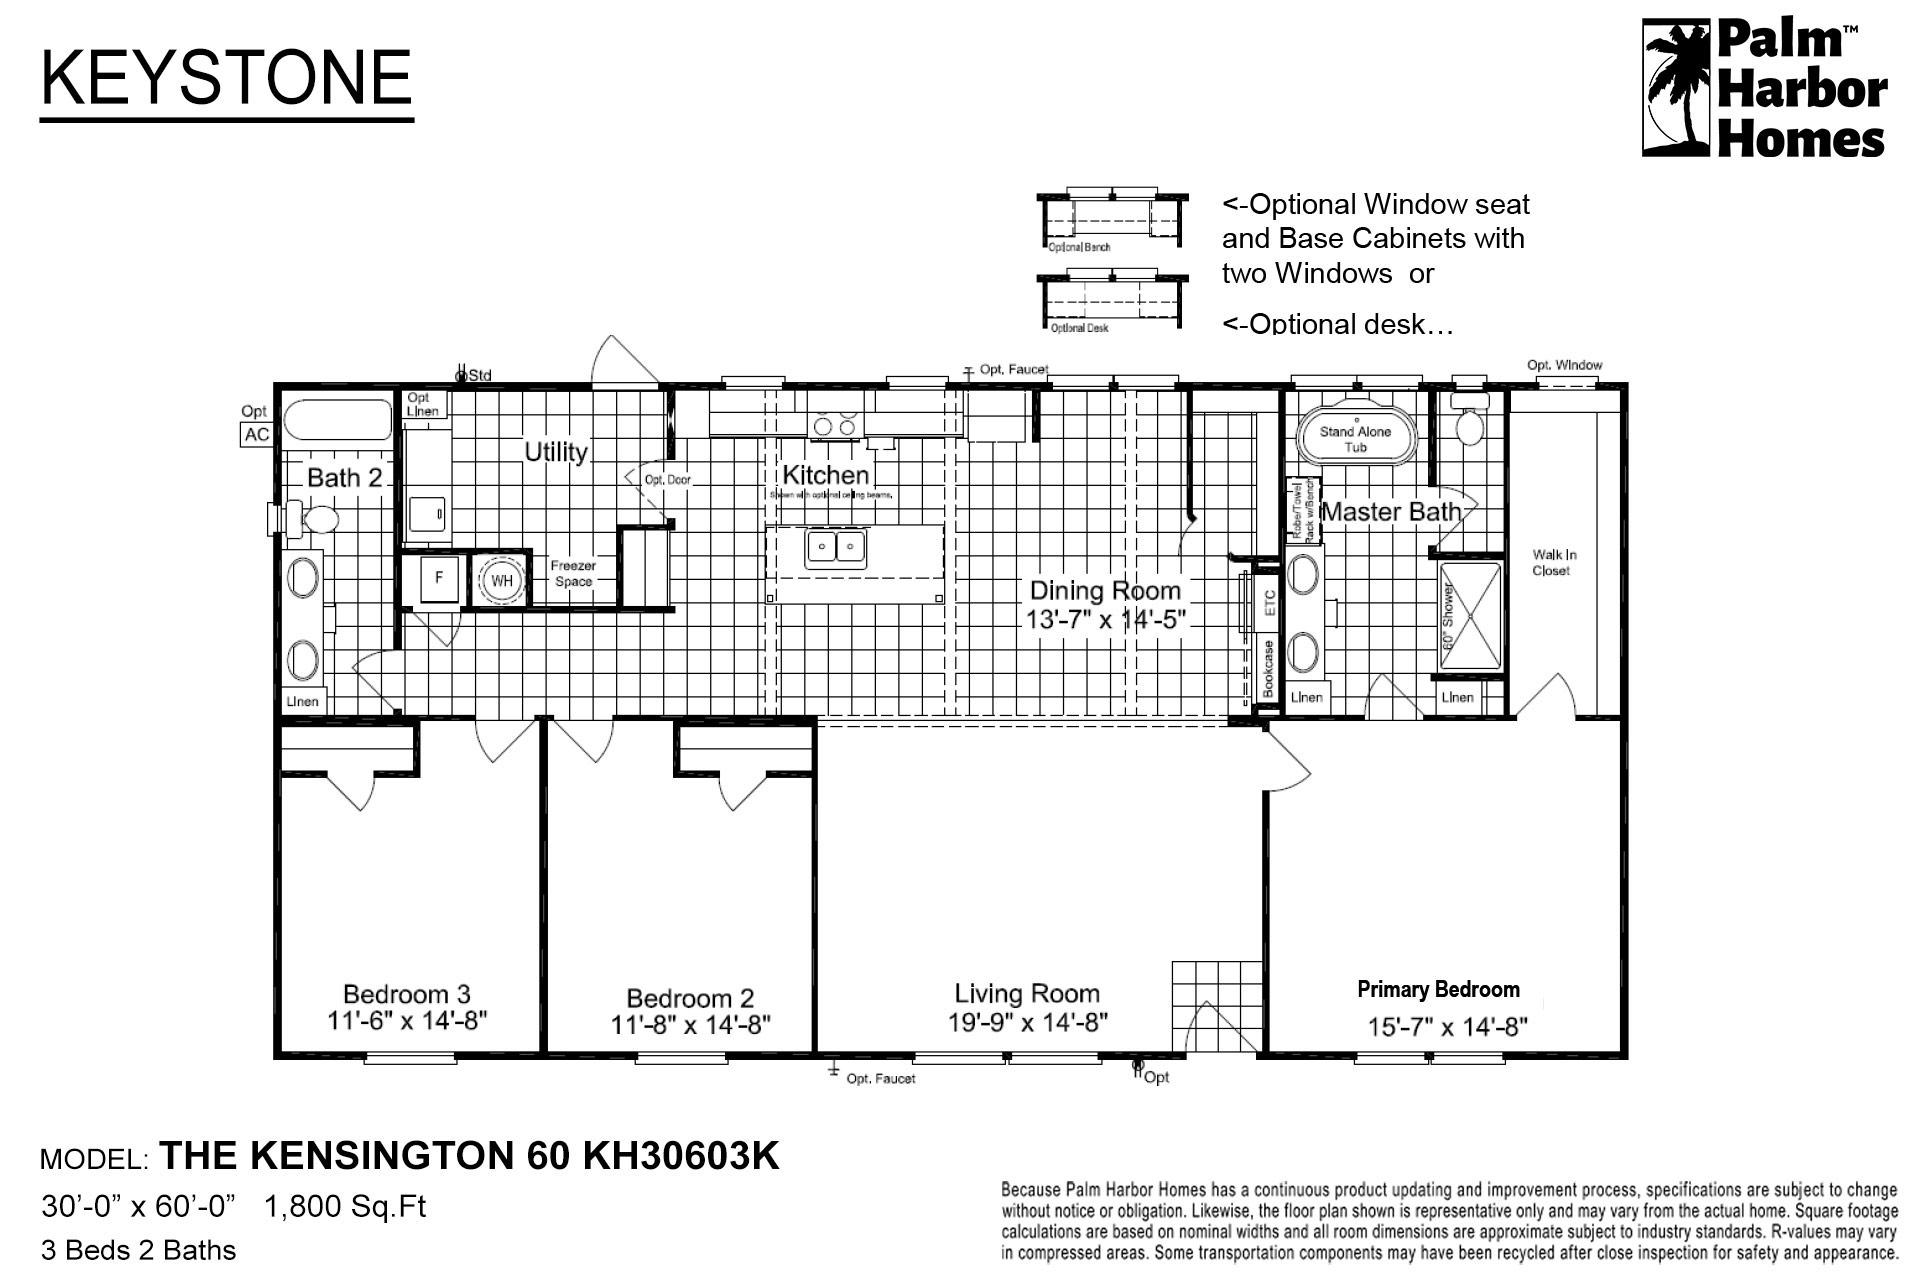 Keystone The Kensington 60 KH30603K Layout